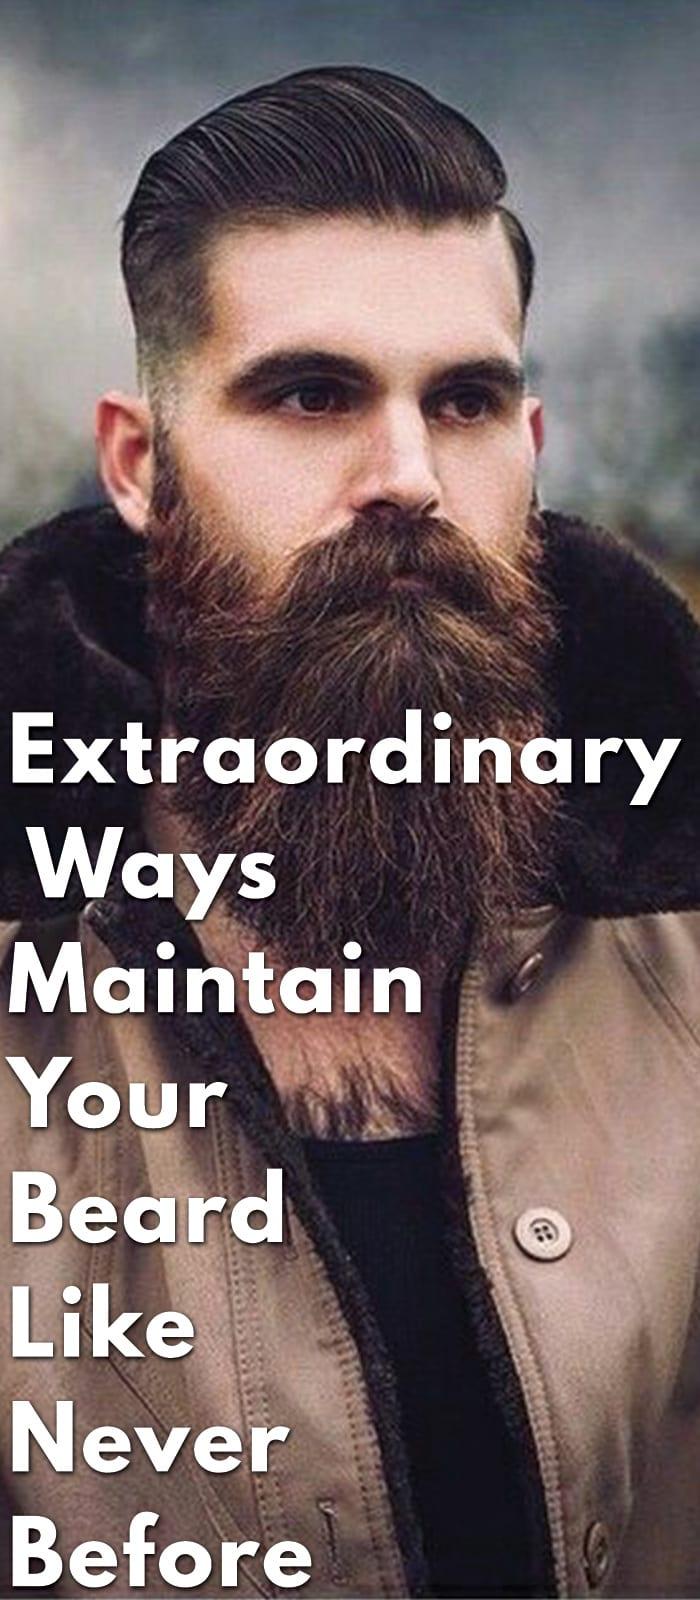 Extraordinary-Ways-Maintain-Your-Beard-Like-Never-Before.